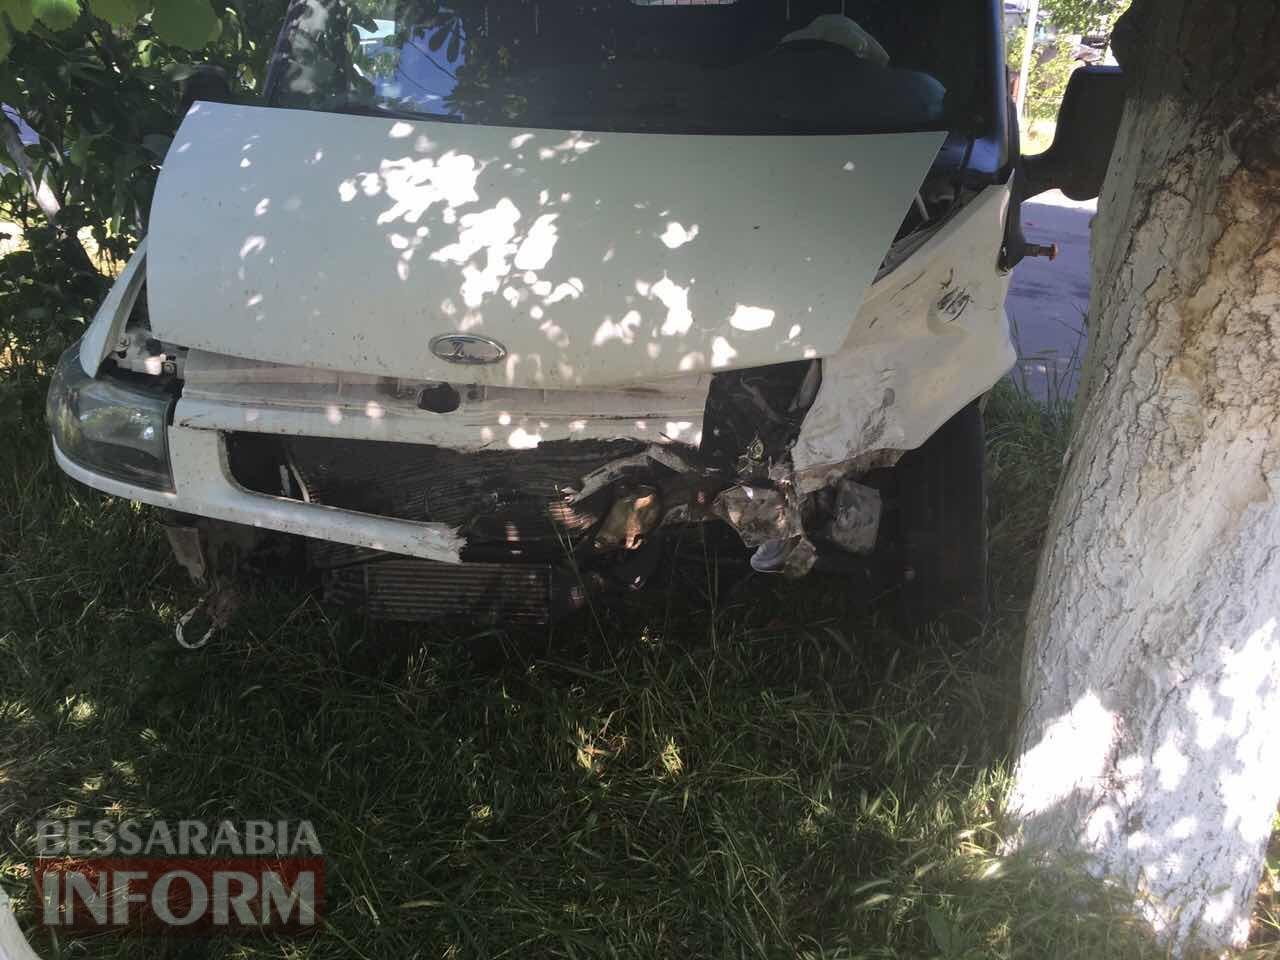 59315bb3312aa_324623463573 ДТП в Измаиле: дорогу не поделили Ford Tranzit и Nissan Primera